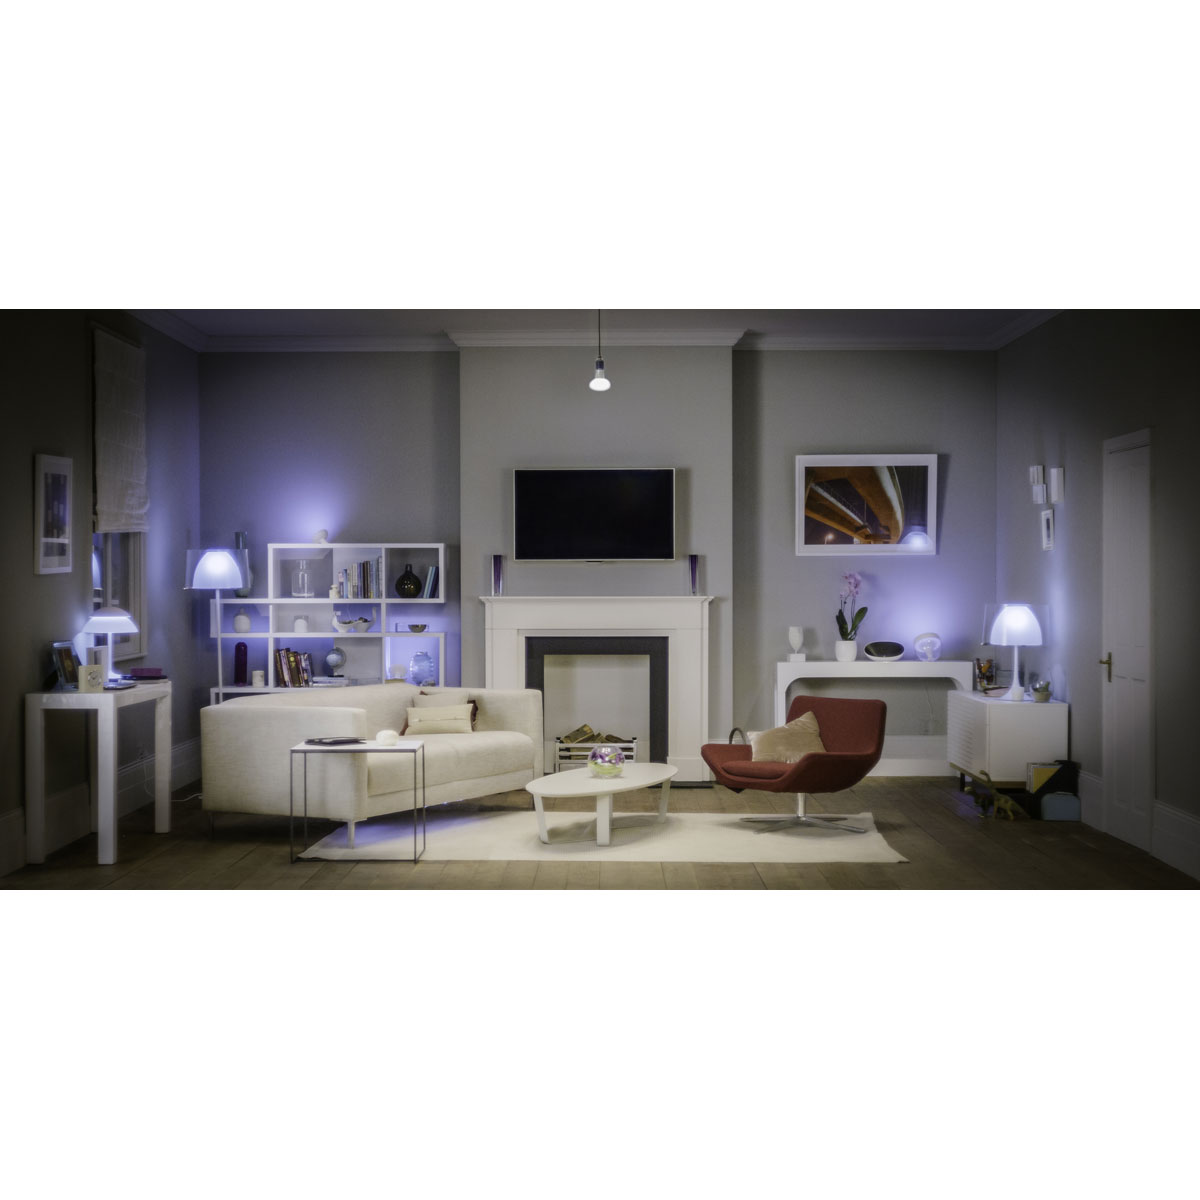 losse philips hue gu10 led lamp bestellen koop veilig bij beaumotica. Black Bedroom Furniture Sets. Home Design Ideas